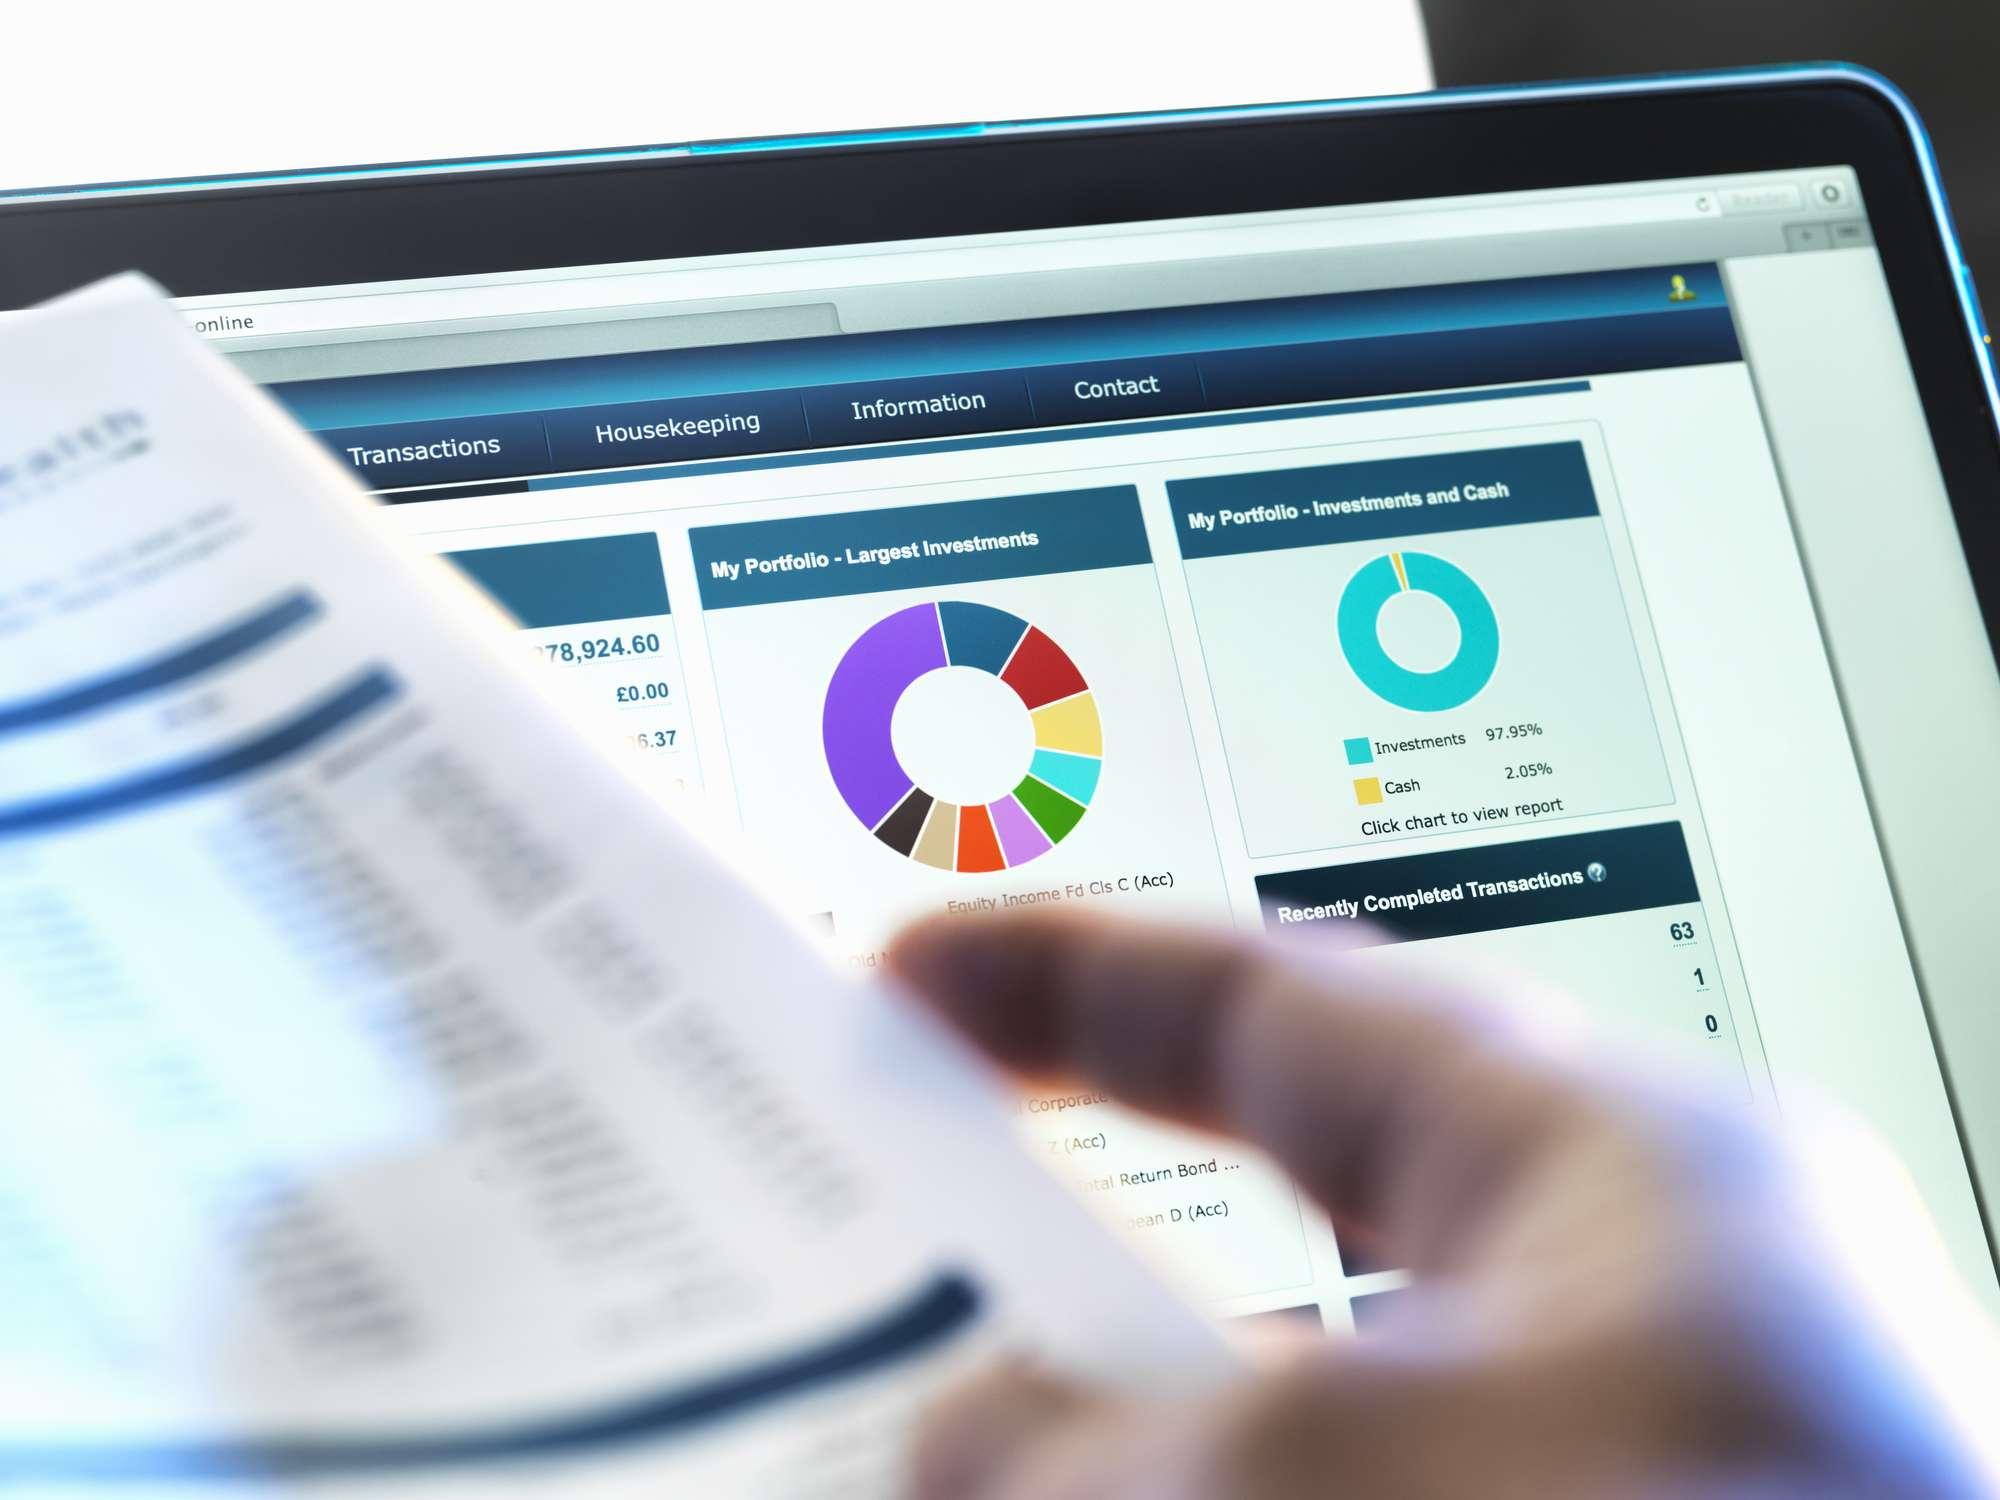 Share Premium Accounts and the Balance Sheet